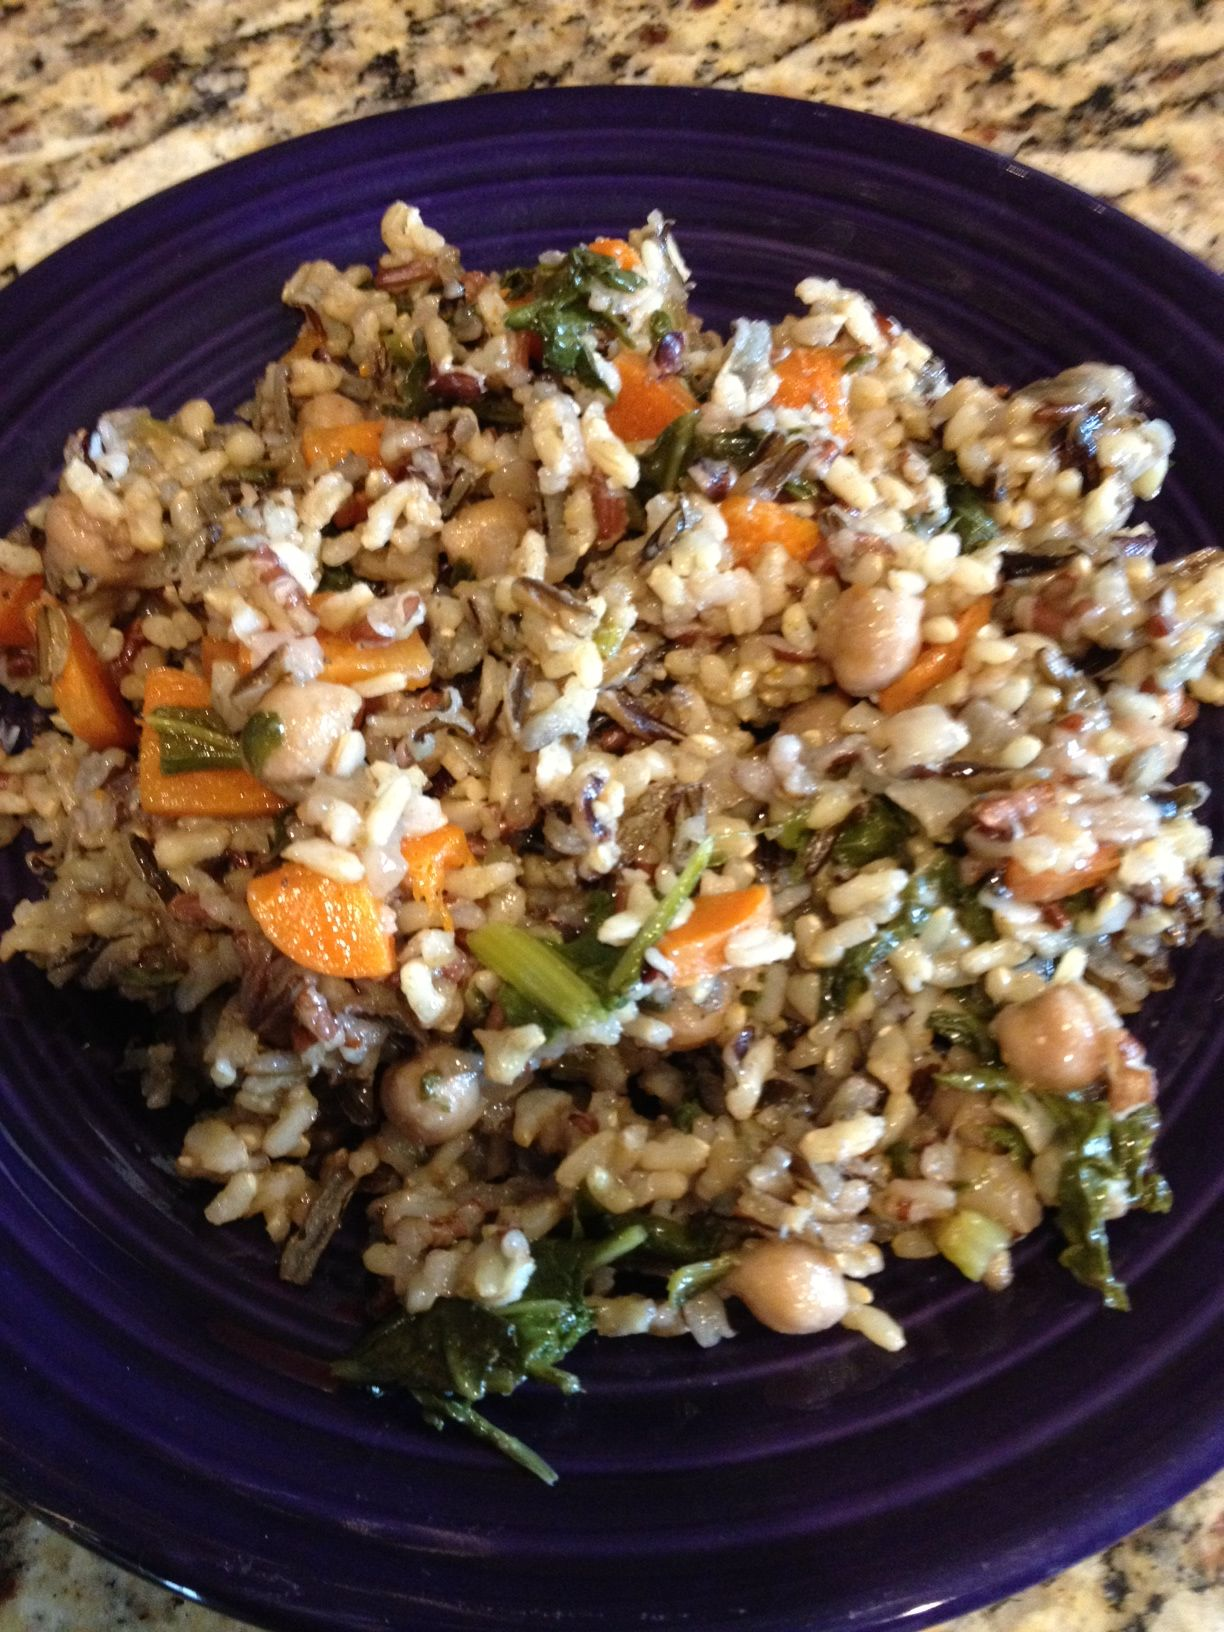 Wild Rice with Chickpeas and Spinach #vegan #oilfree #glutenfree